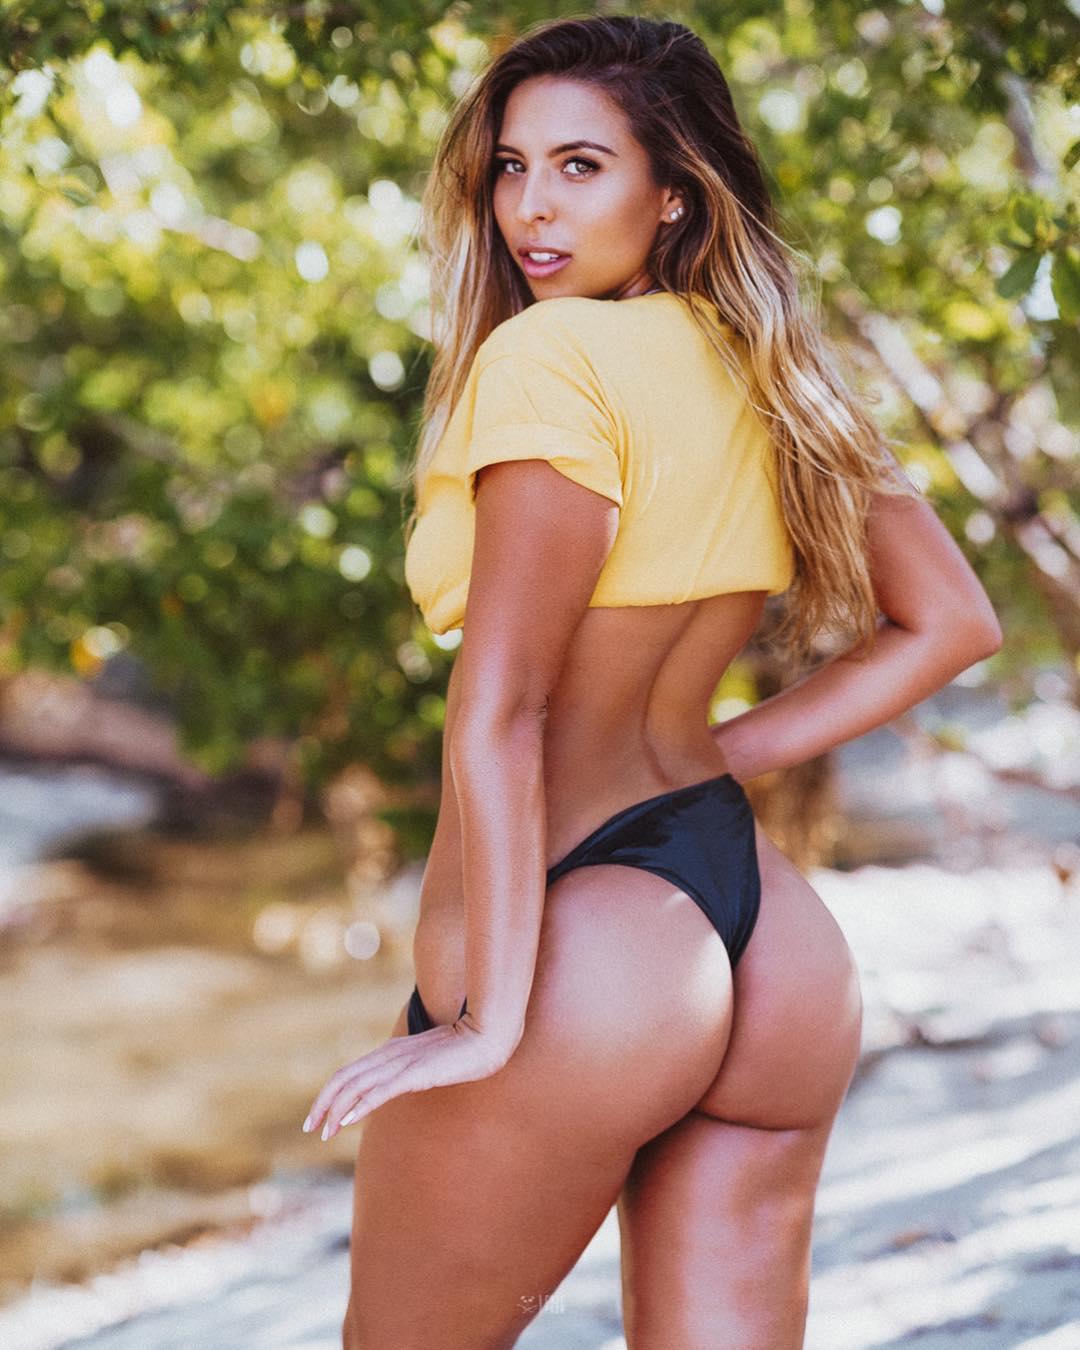 Natalia Garibotto Nude Onlyfans Leaked 0016